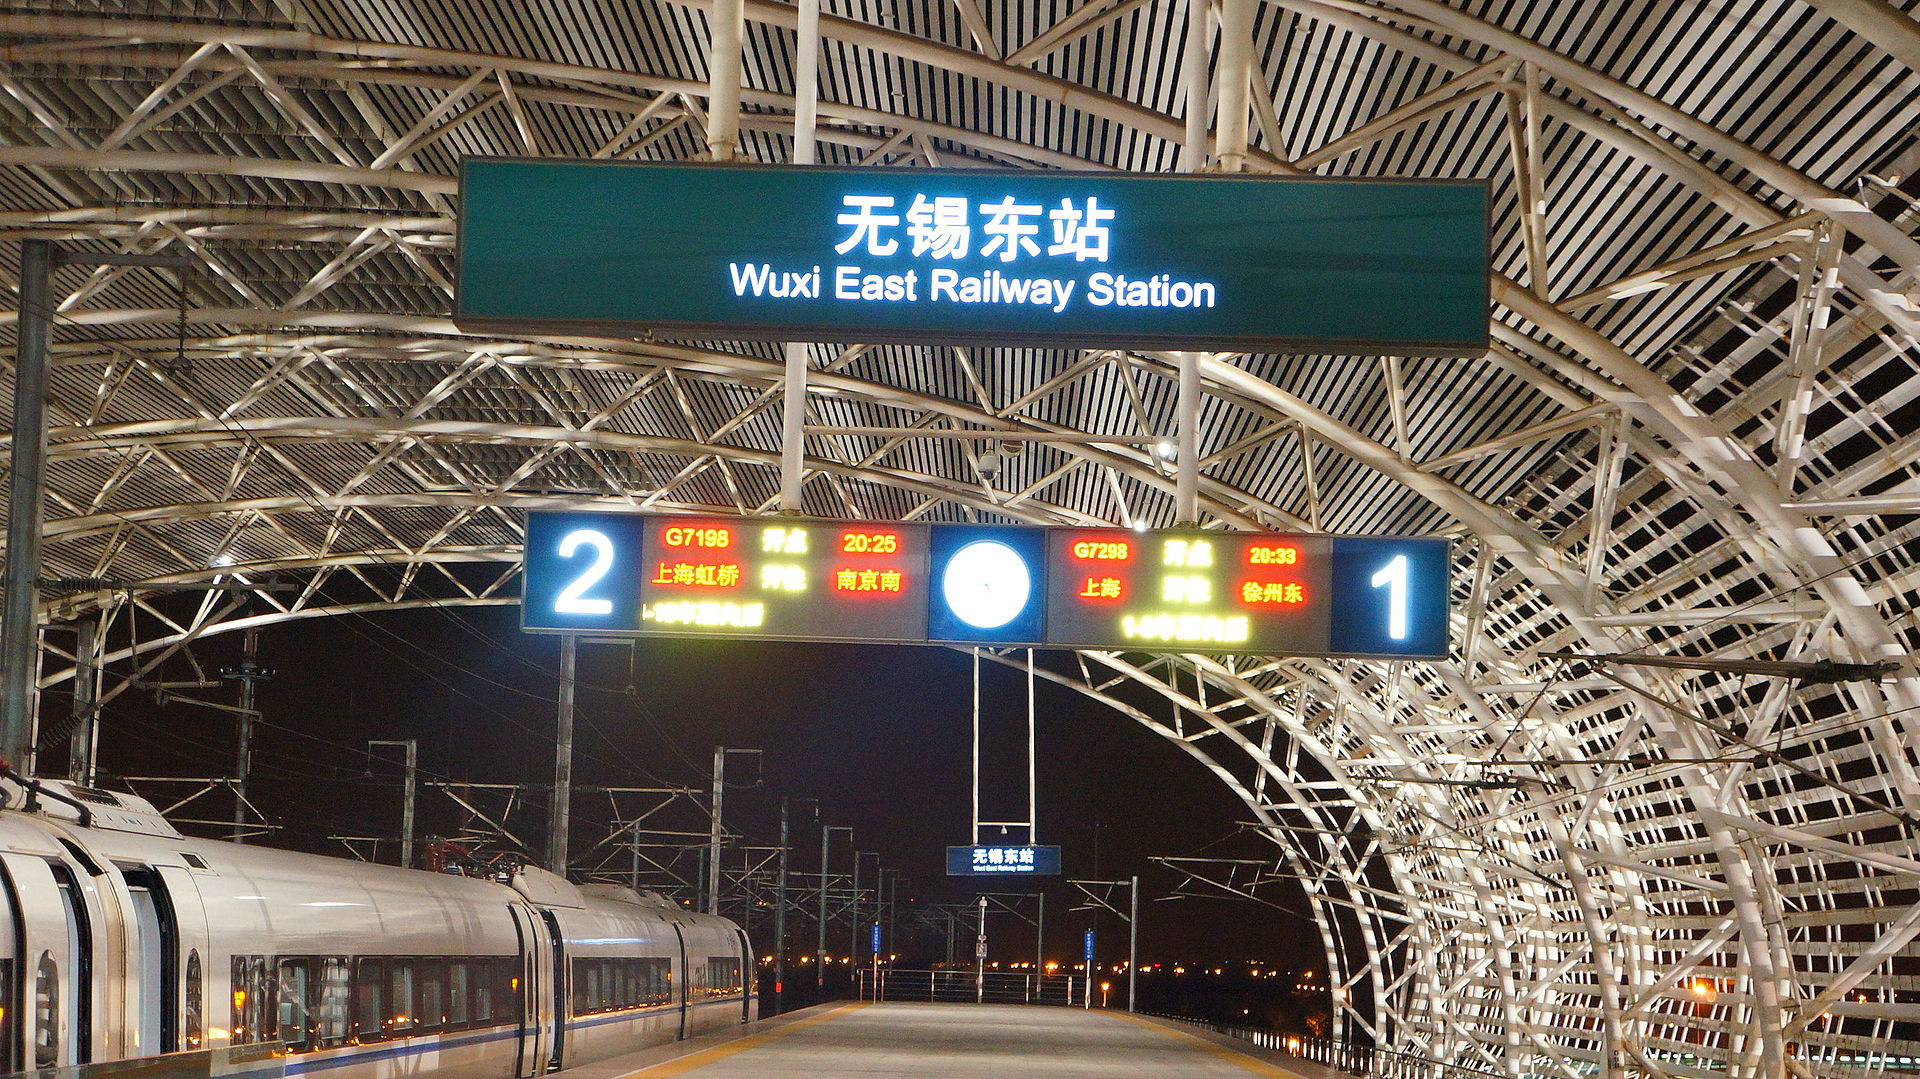 Wuxi east railway station wikipedia for China railway 13 bureau group corporation